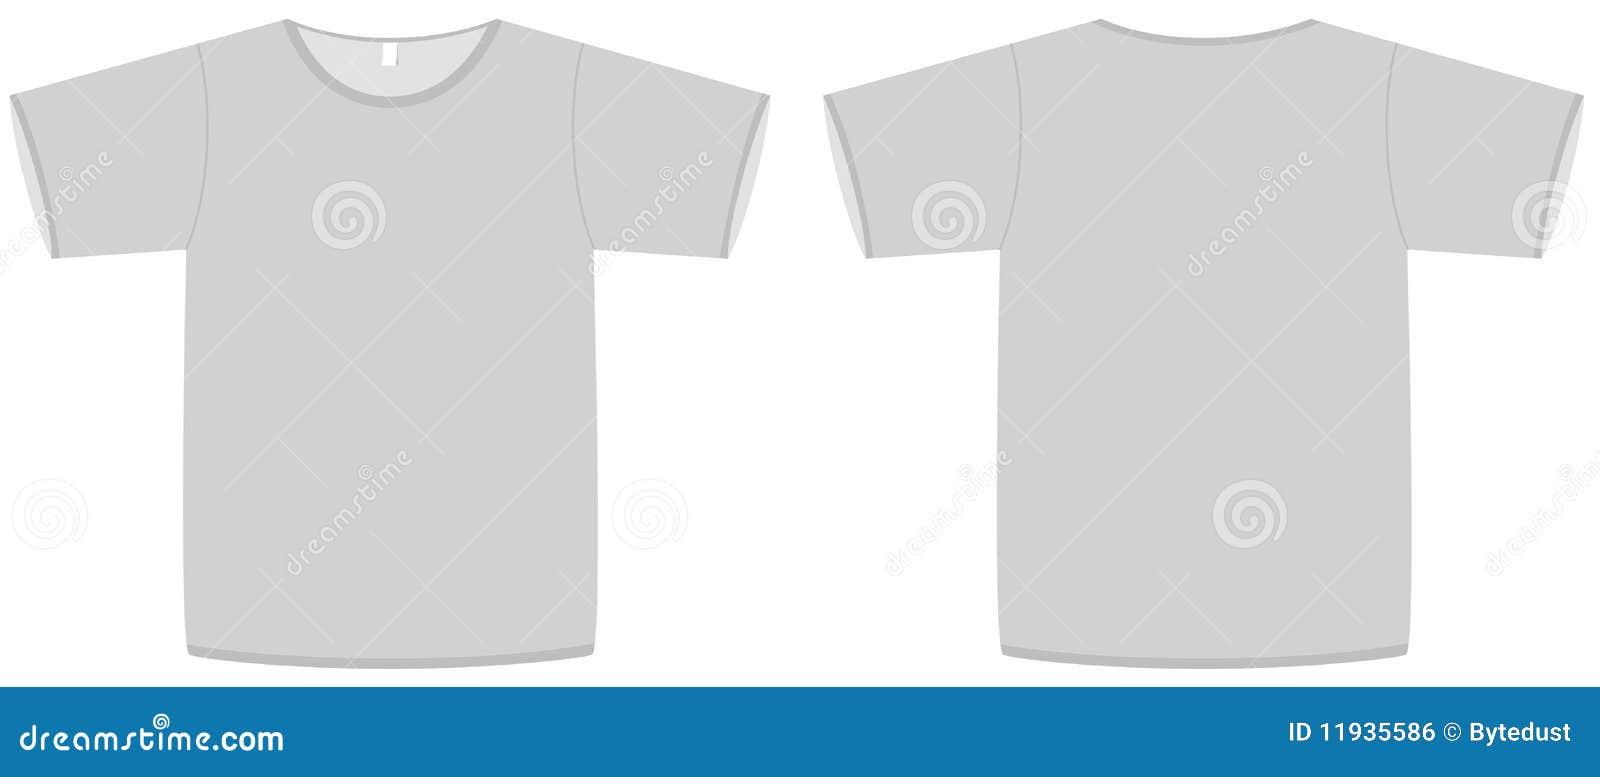 Basic Unisex T-shirt Template Vector Illustration Stock Vector ...